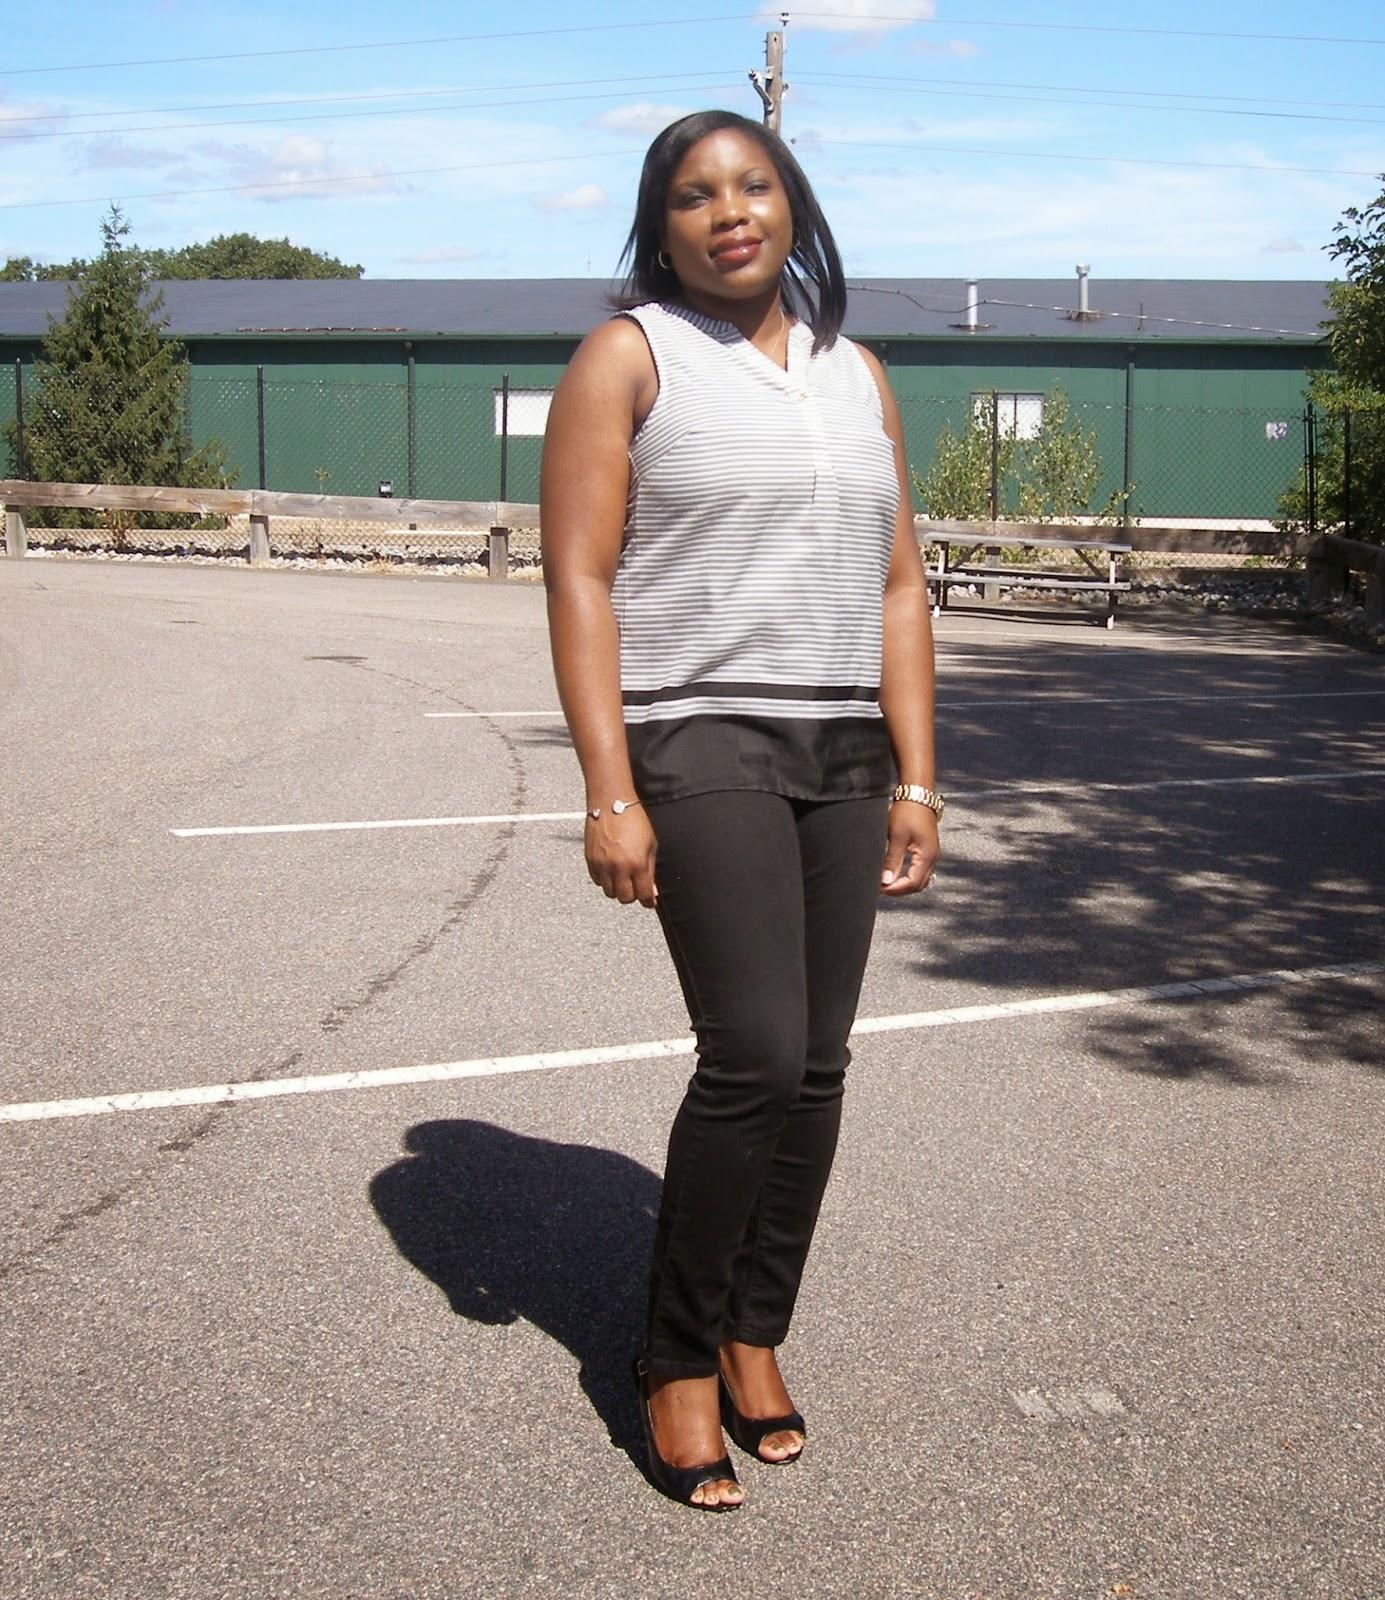 Black skinny jeans fit